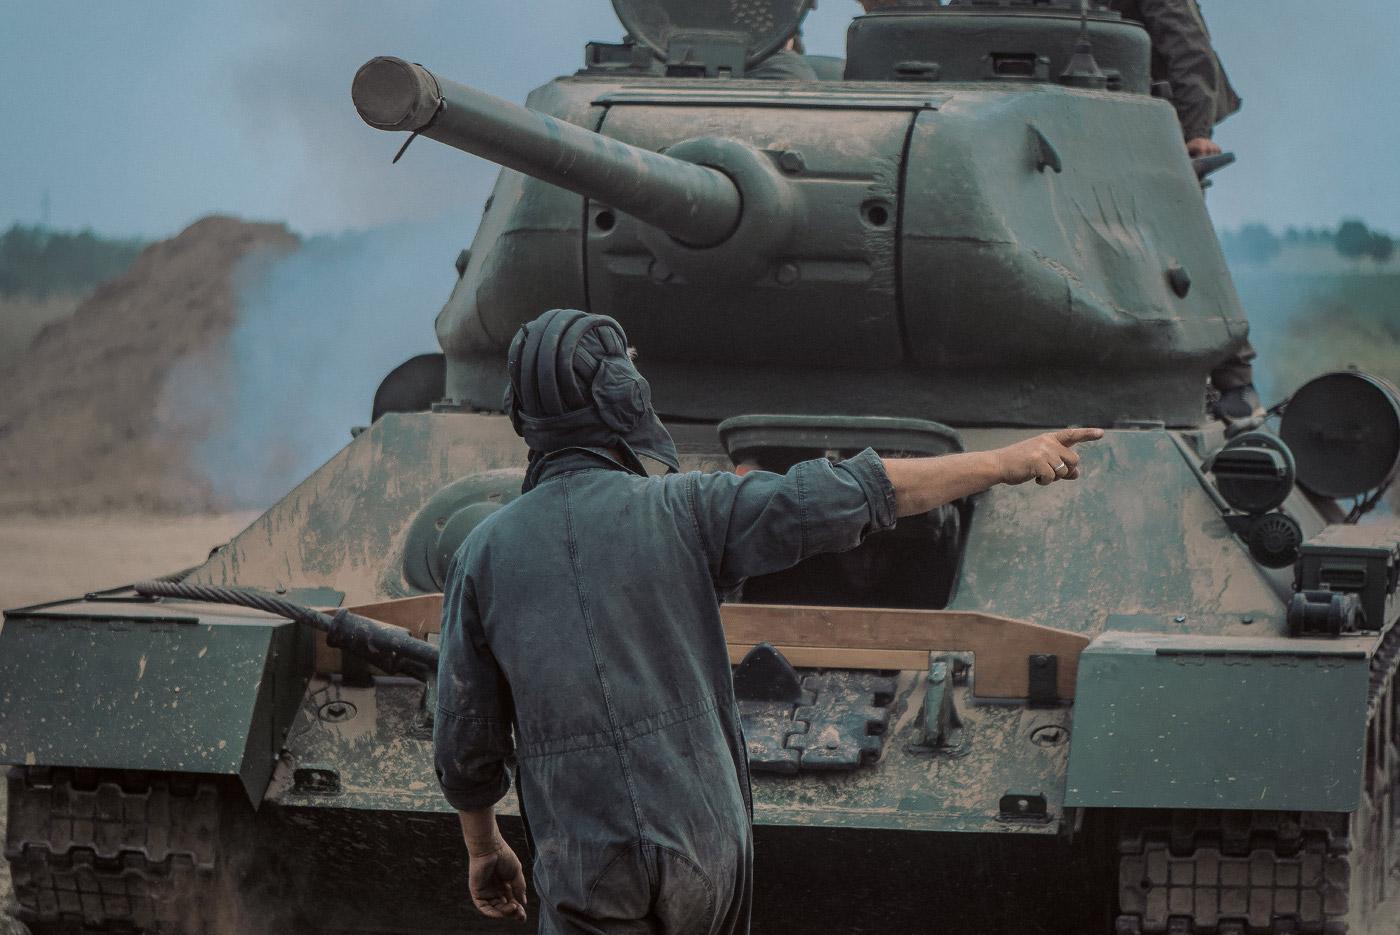 Panzertreffen 2018, T-34/85